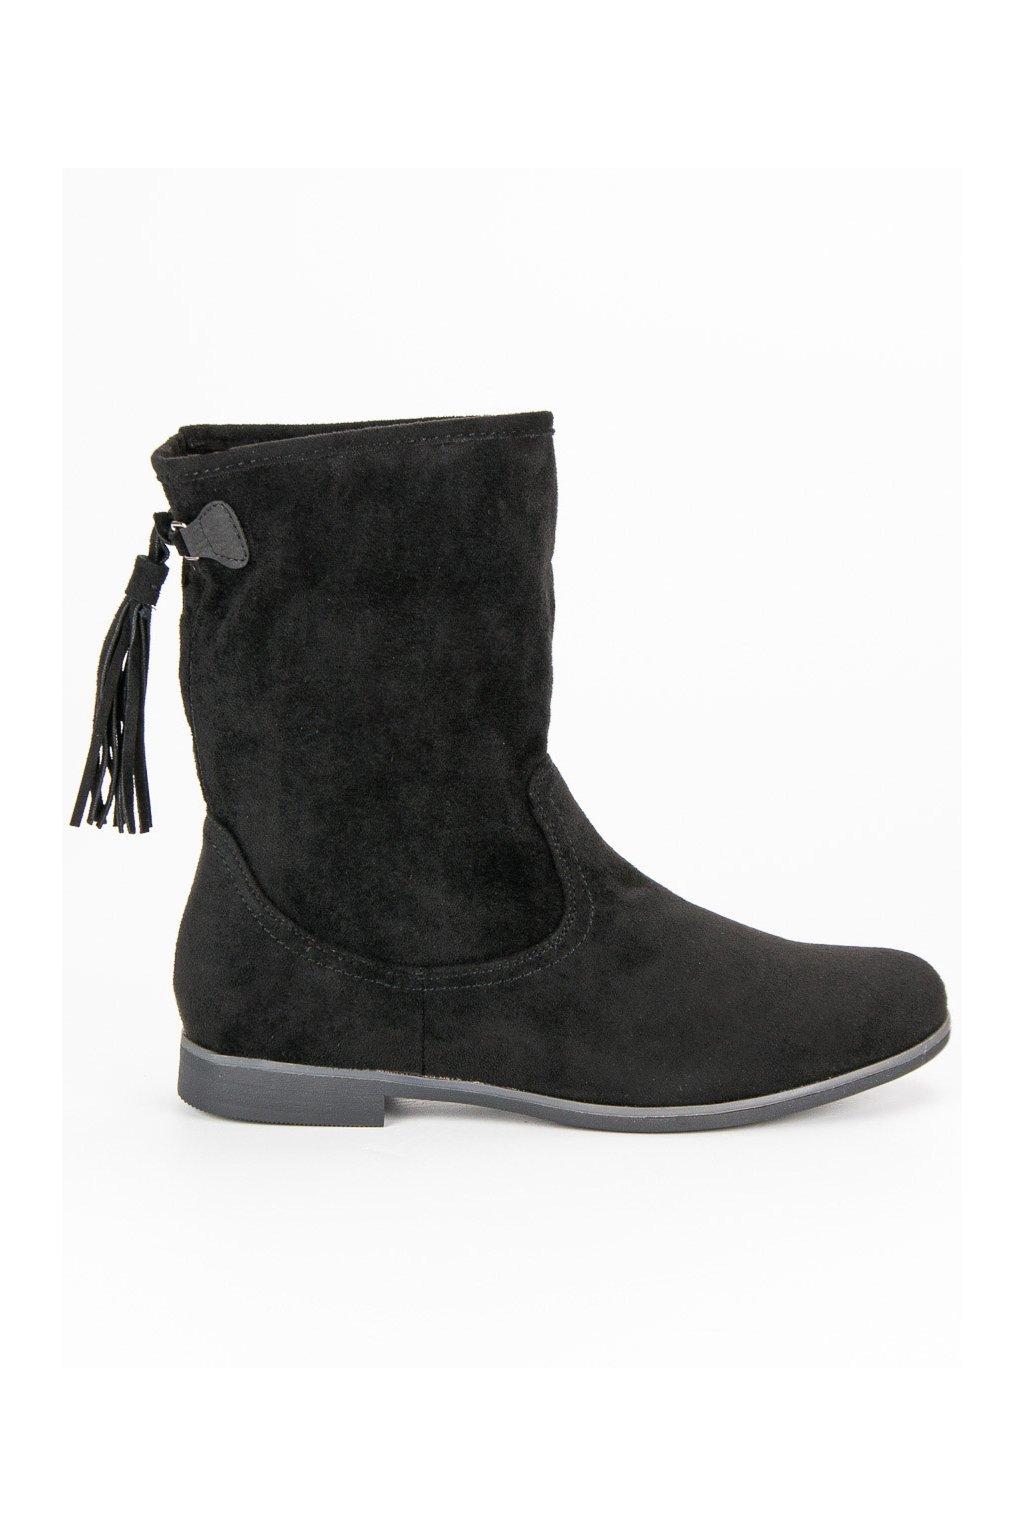 Čierne dámske topánky na plochom opätku Weide HFN-811B